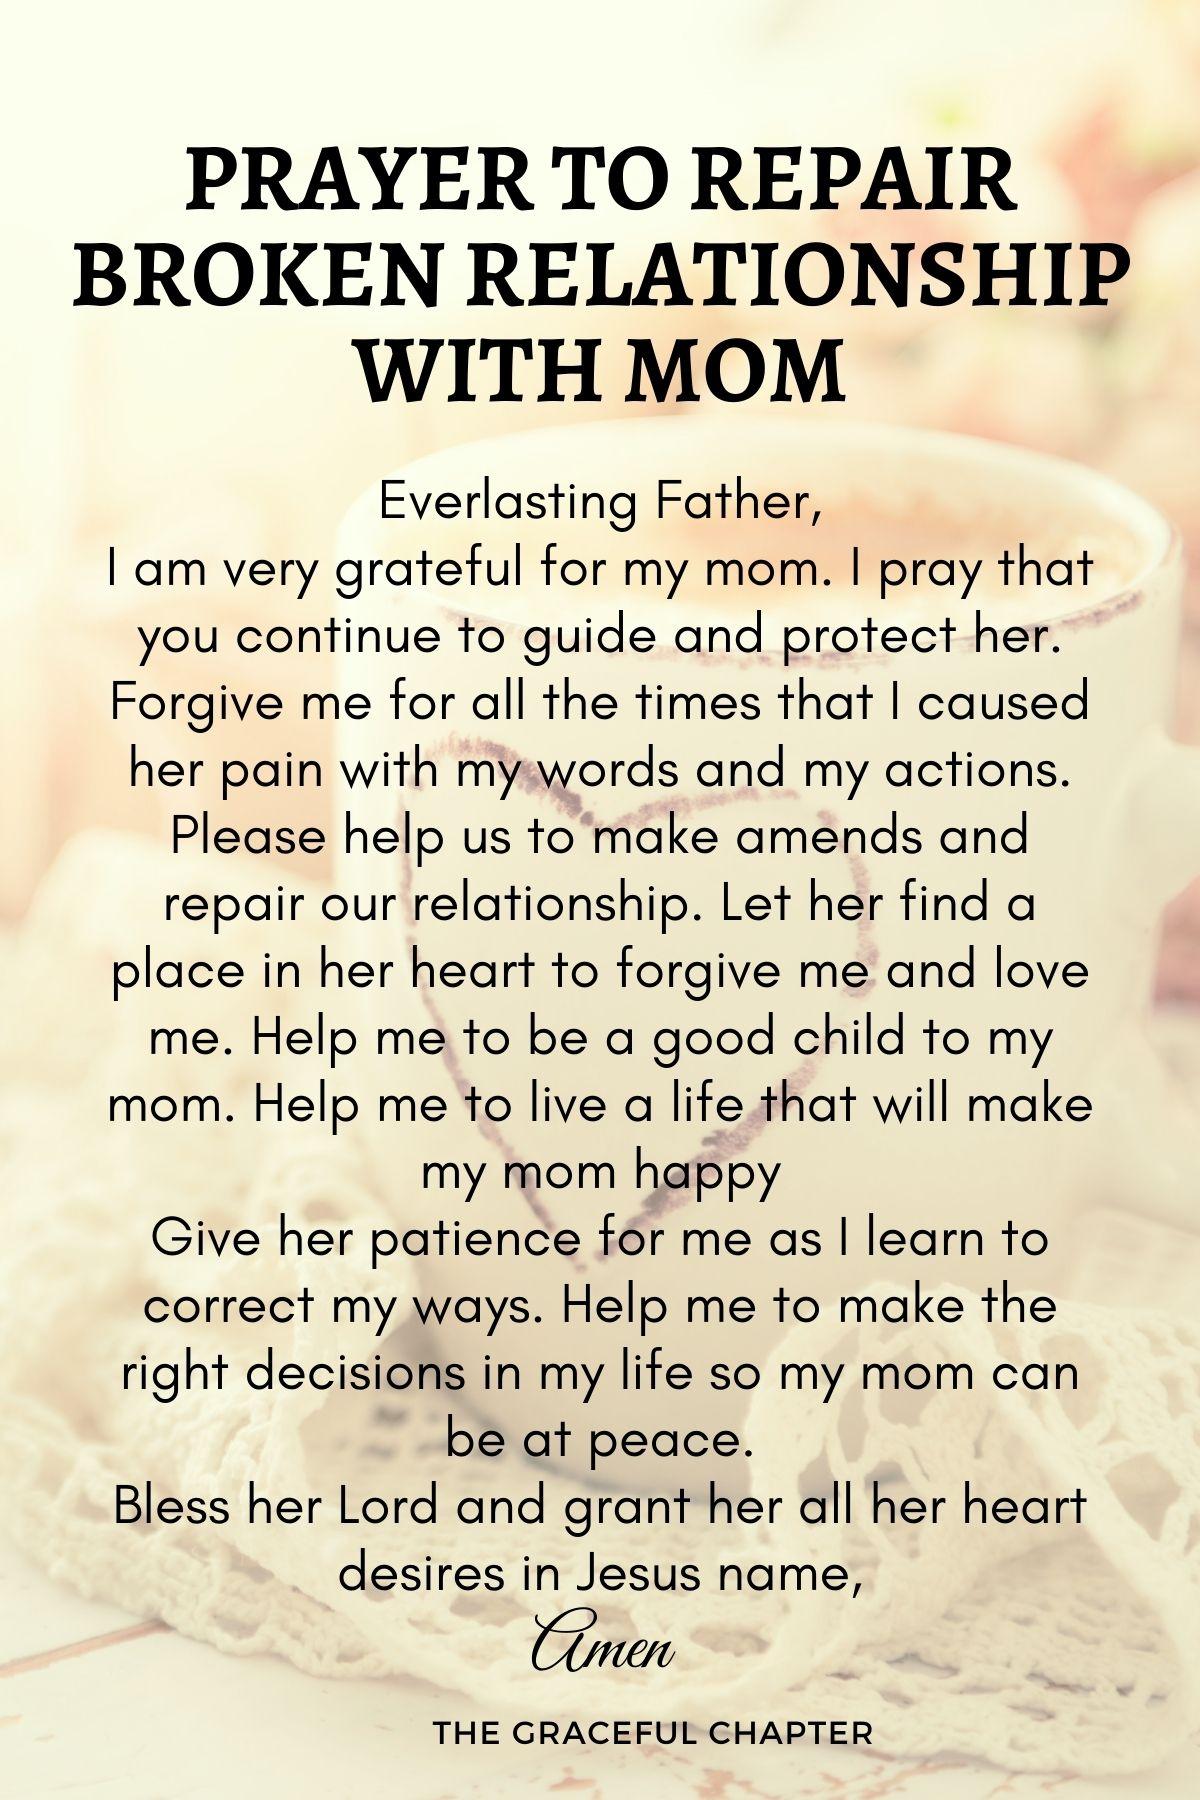 Prayer to repair broken relationship with mom